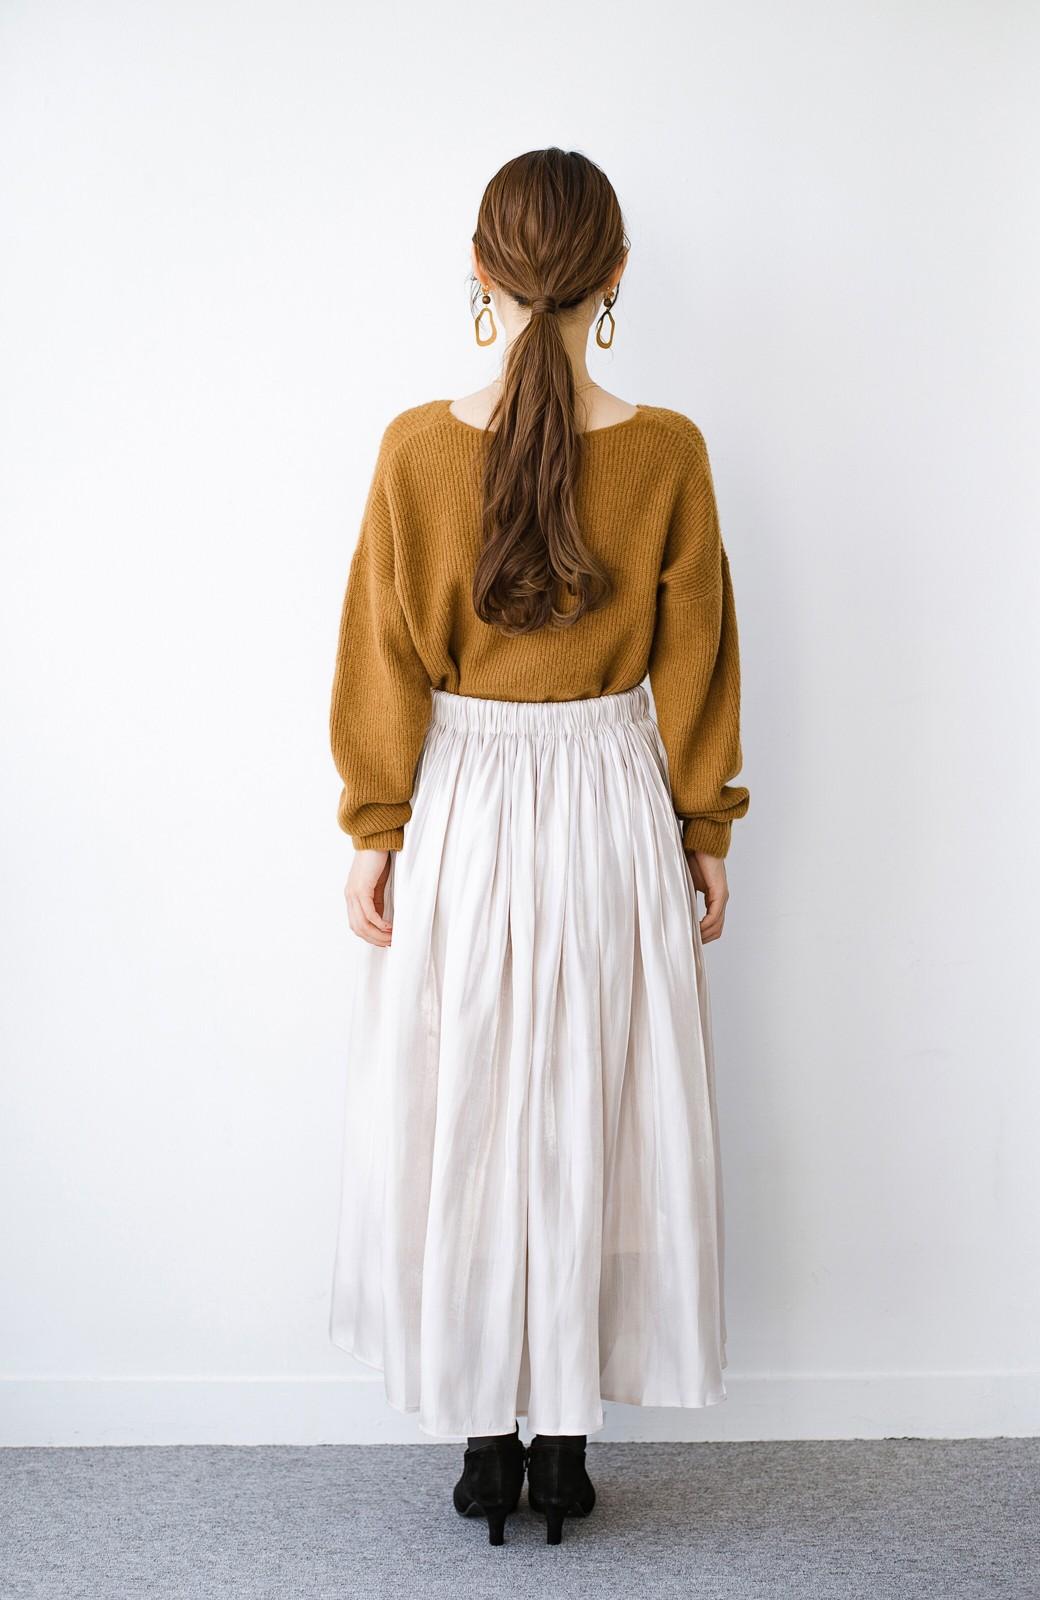 haco! 【人気のため新色追加!】1枚でも重ね着にも便利なキラキラ素材がかわいいロングスカート by laulea <アイボリー>の商品写真17